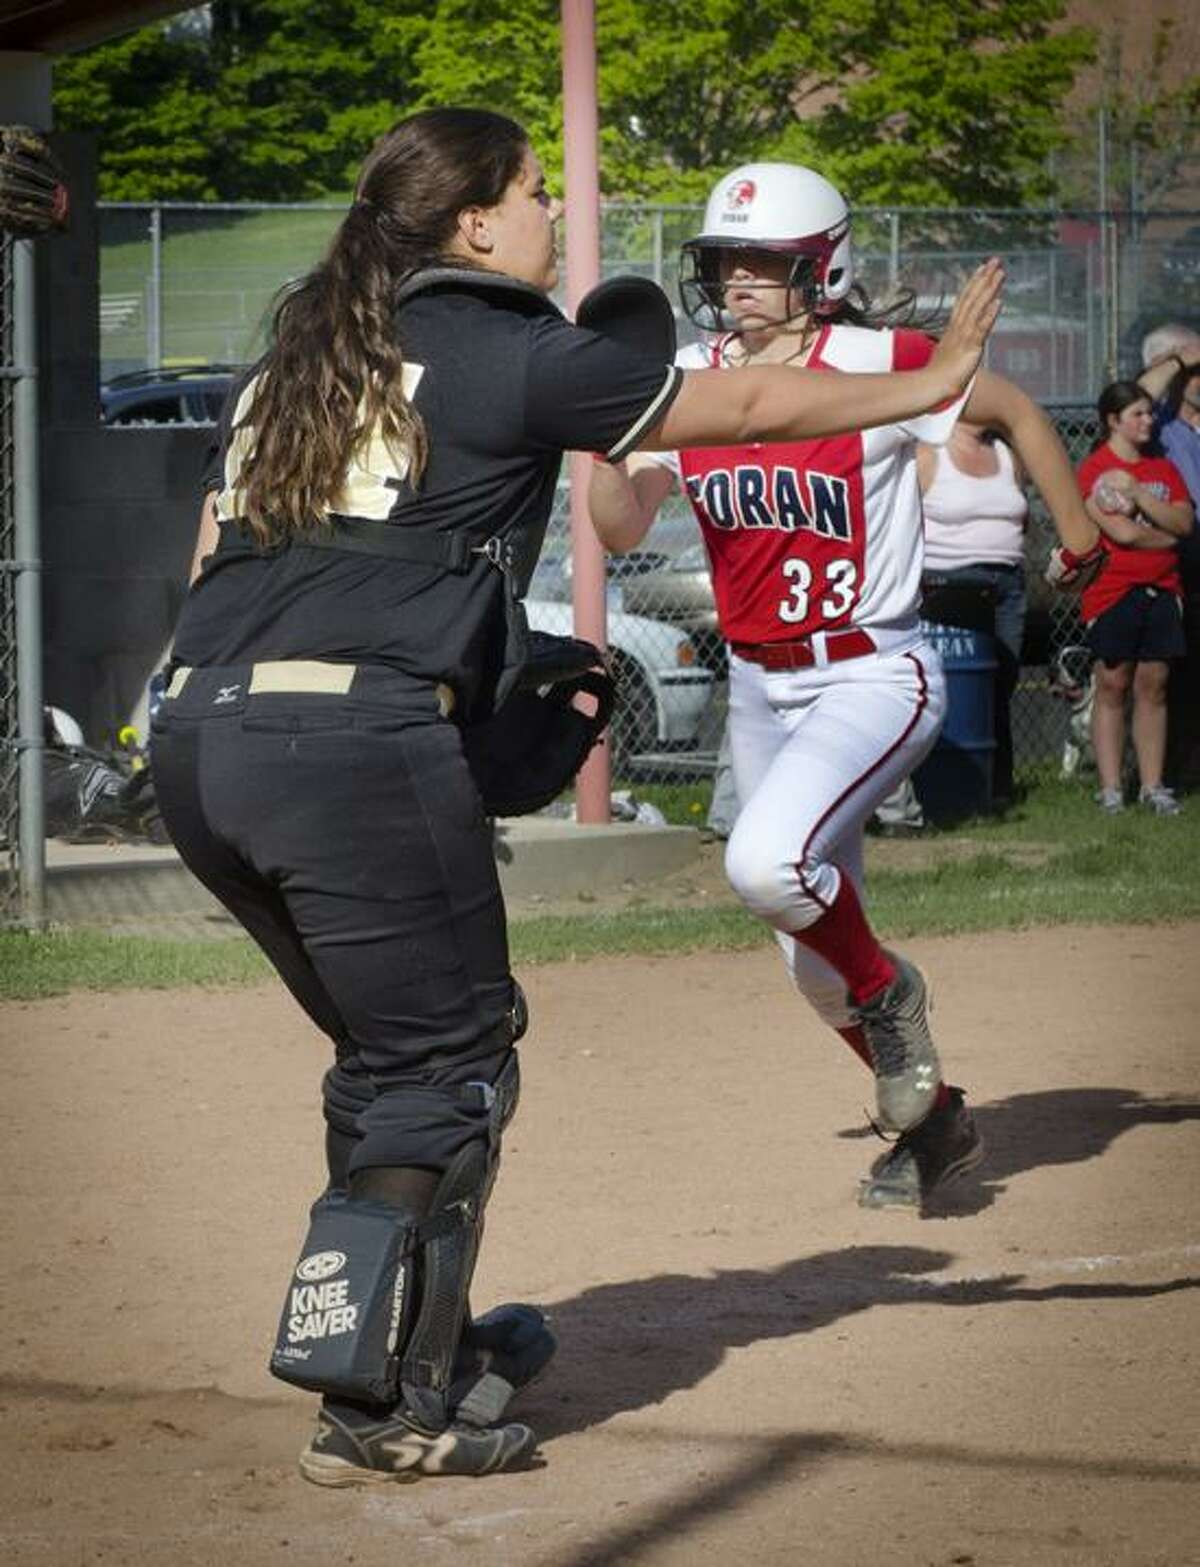 SPORTs-Law Catcher, Amanda Leone, waves off the throw as Foran's Rebekah DeRosa (L) safely crosses the plate Melanie Stengel/Register